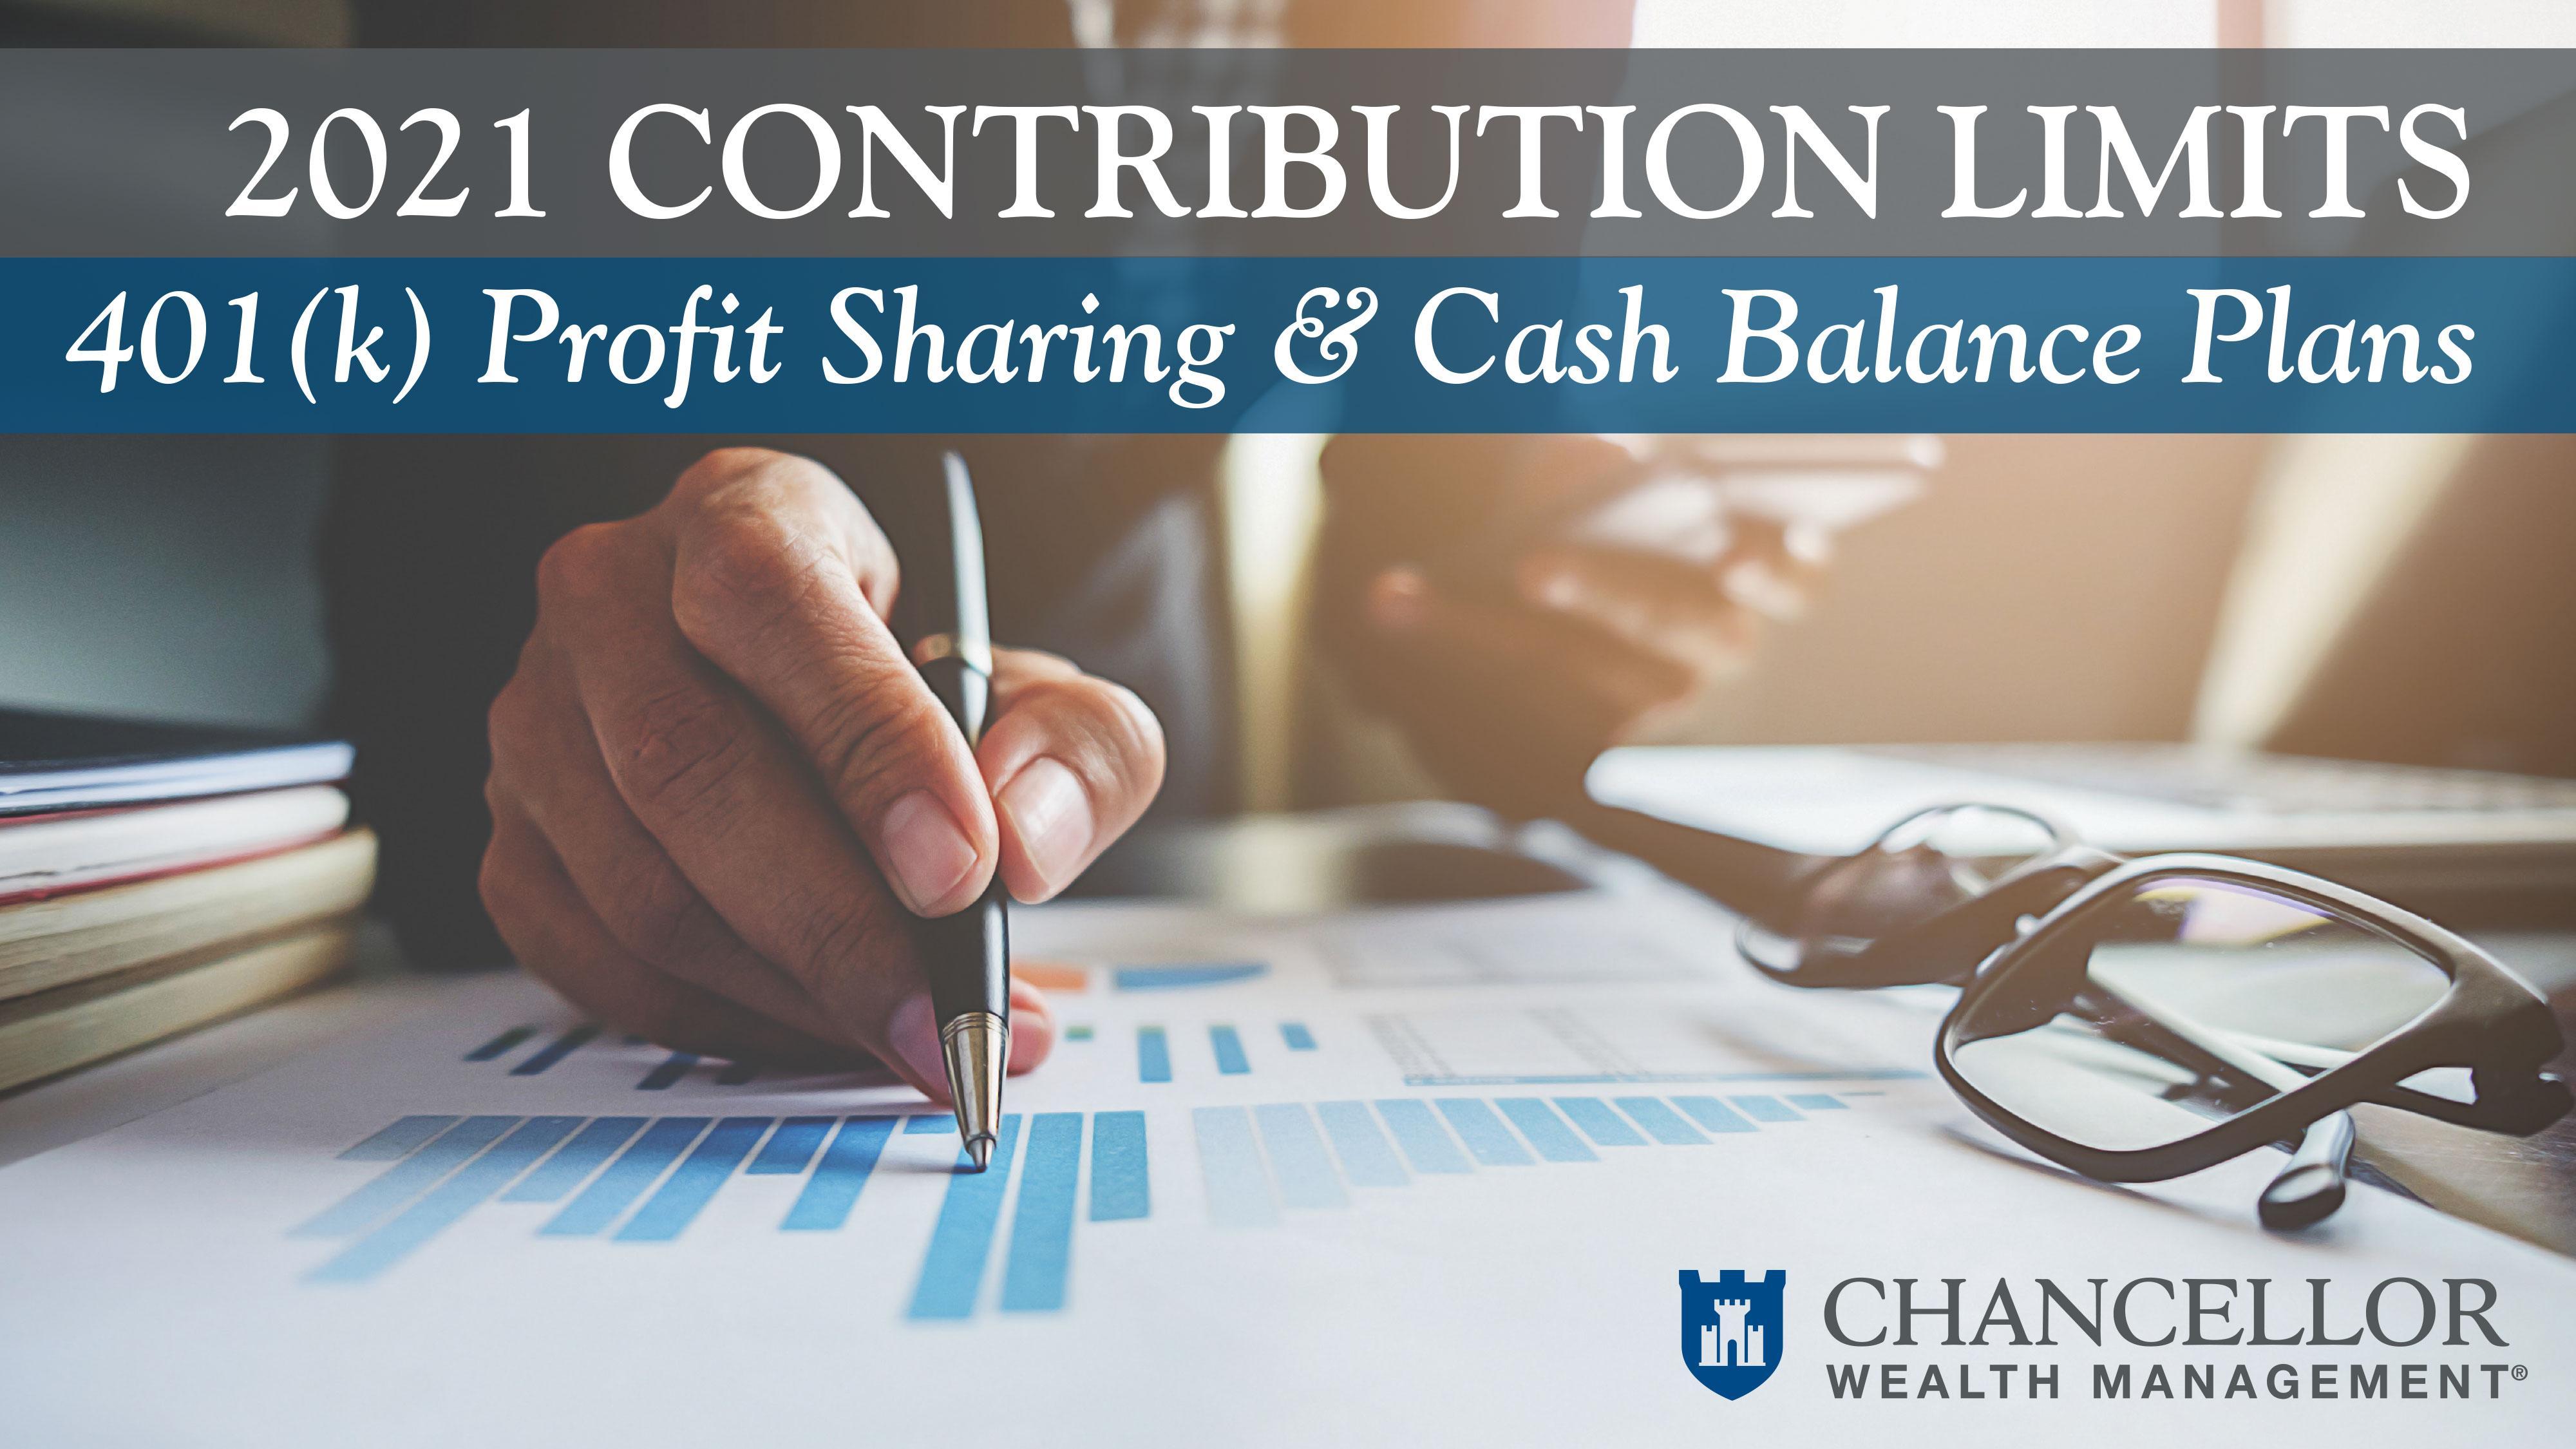 2021 Contribution Limits for 401(k) Profit Sharing & Cash Balance Plans Thumbnail